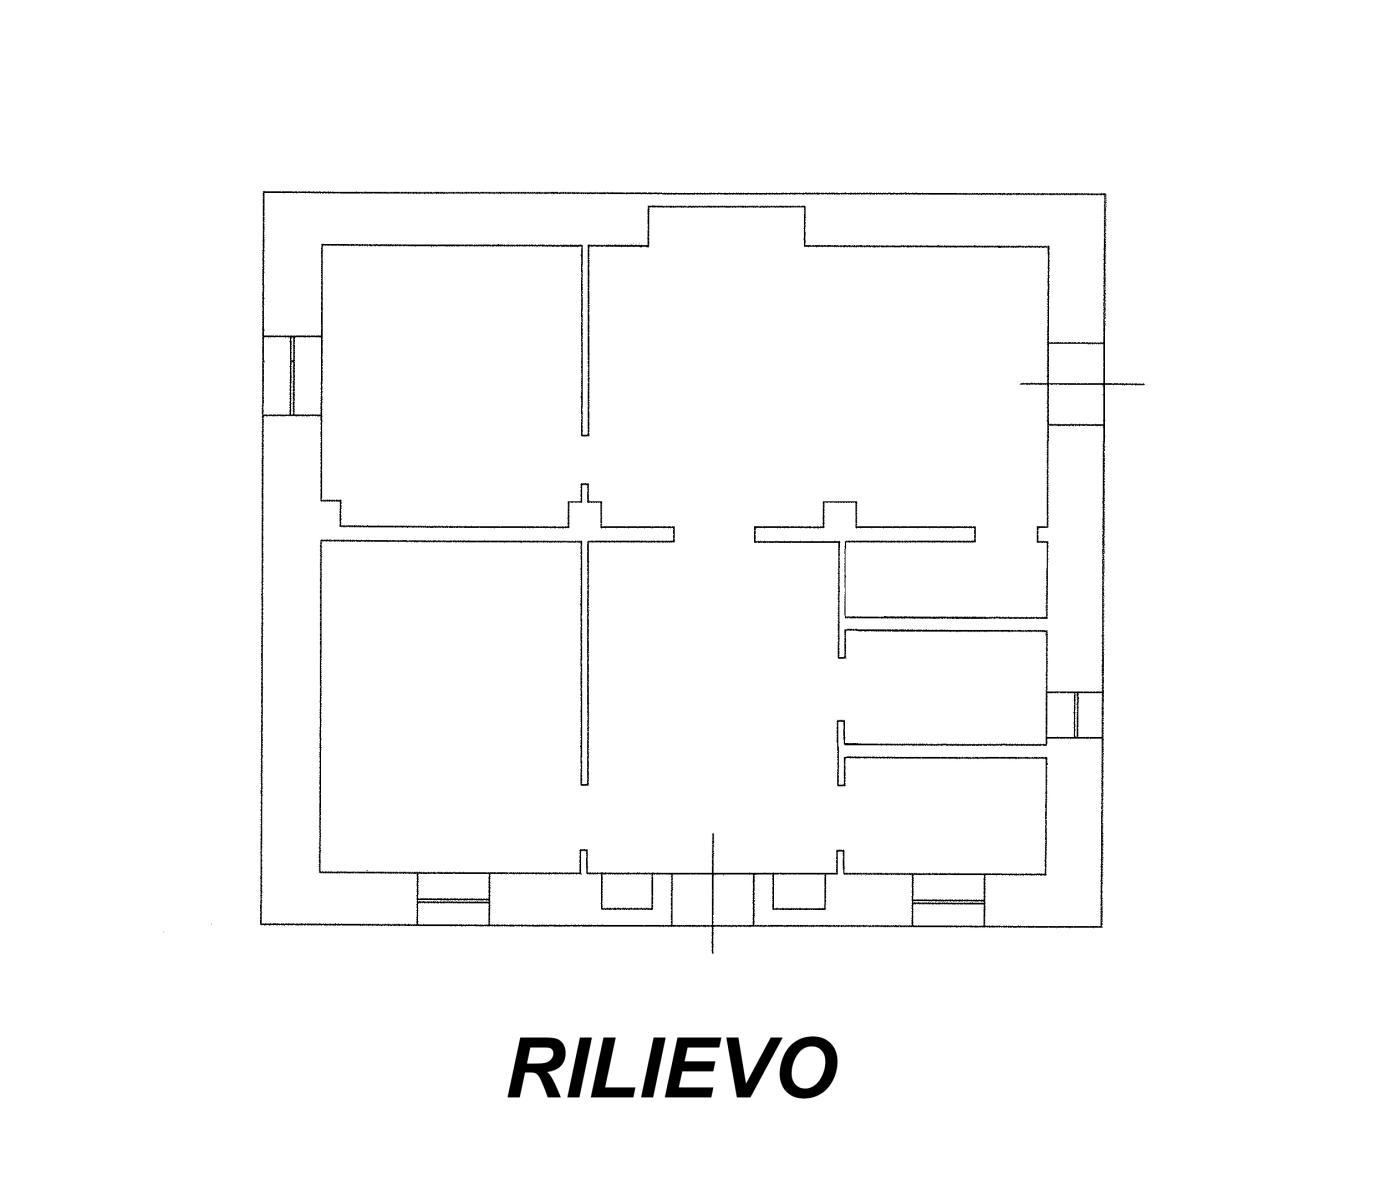 Vendita casolari e lamie – Contrada Chiobbica, Ostuni (Brindisi)